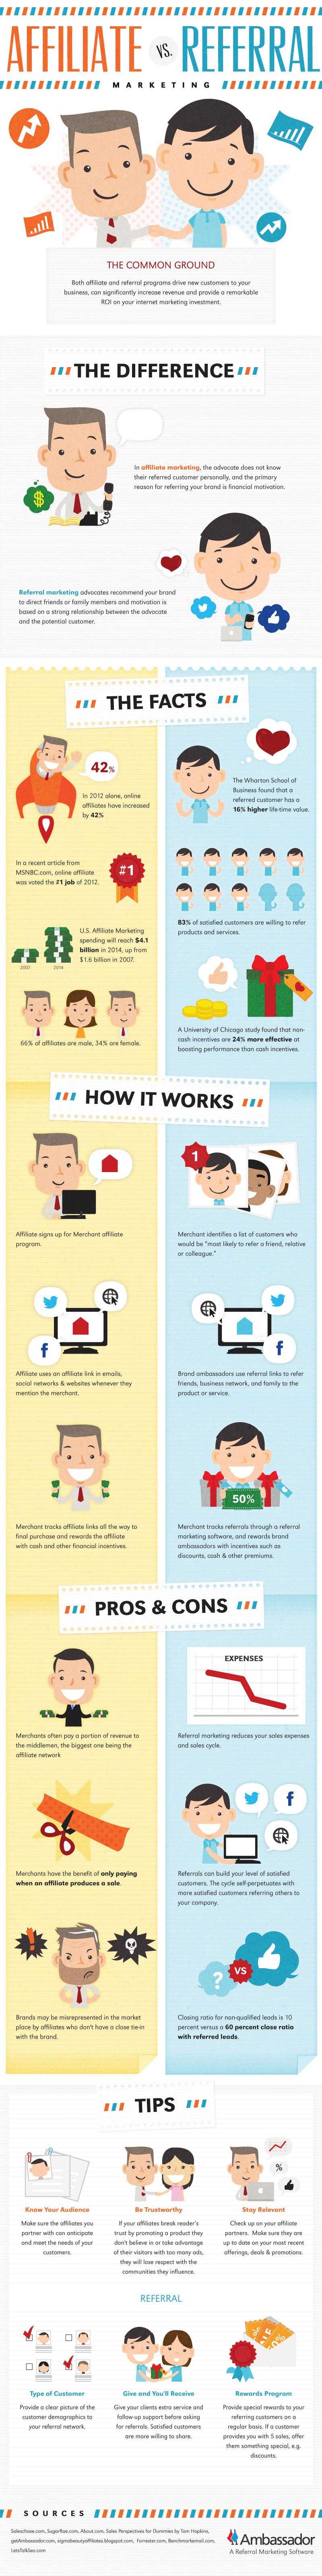 Affiliate Marketing vs. Referral Marketing (Infographic)